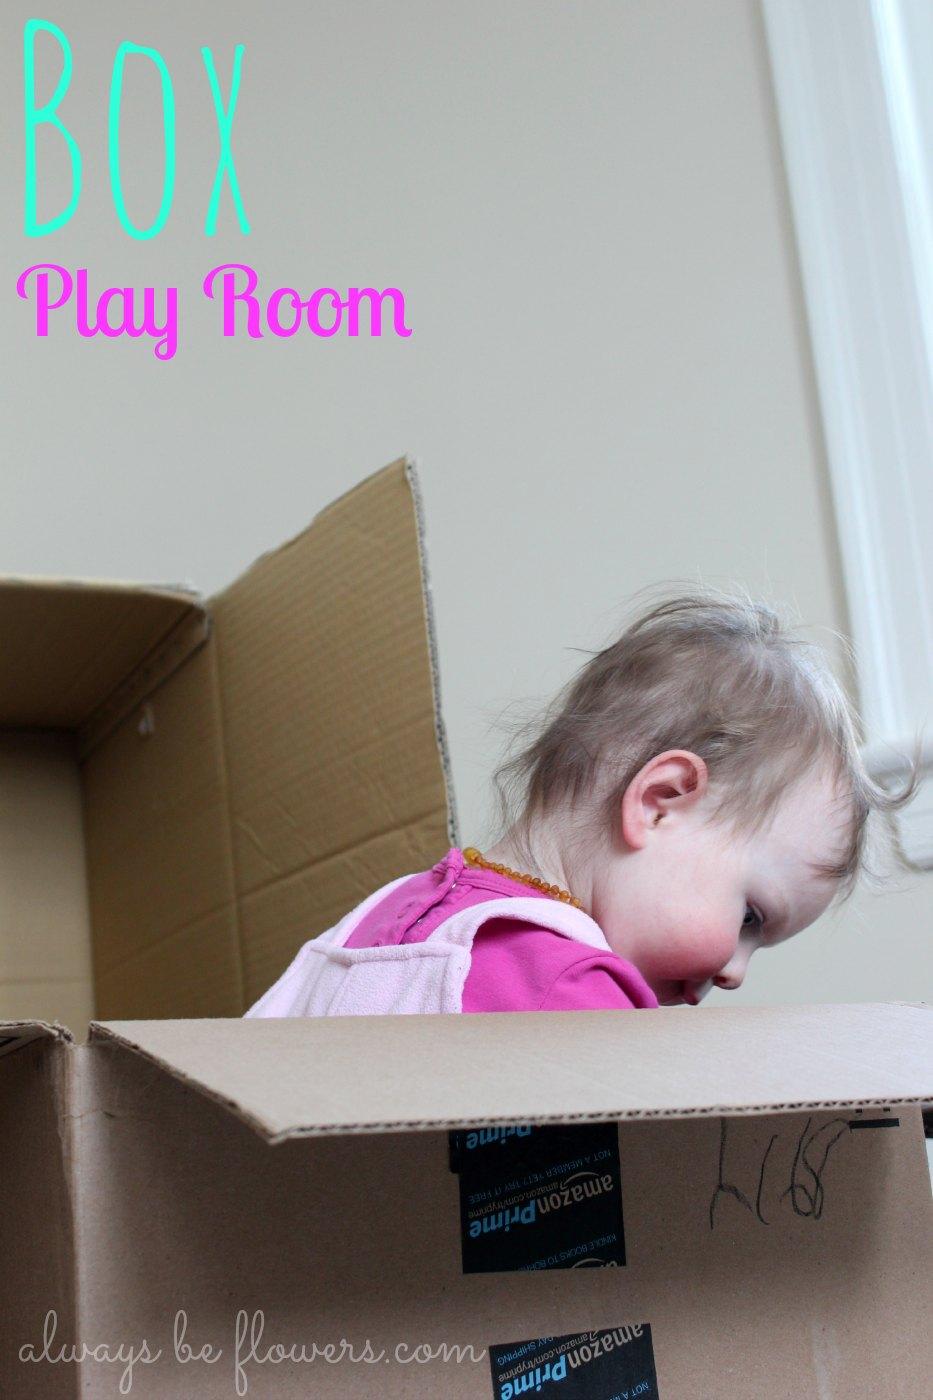 2014-box-play-room-2.jpg